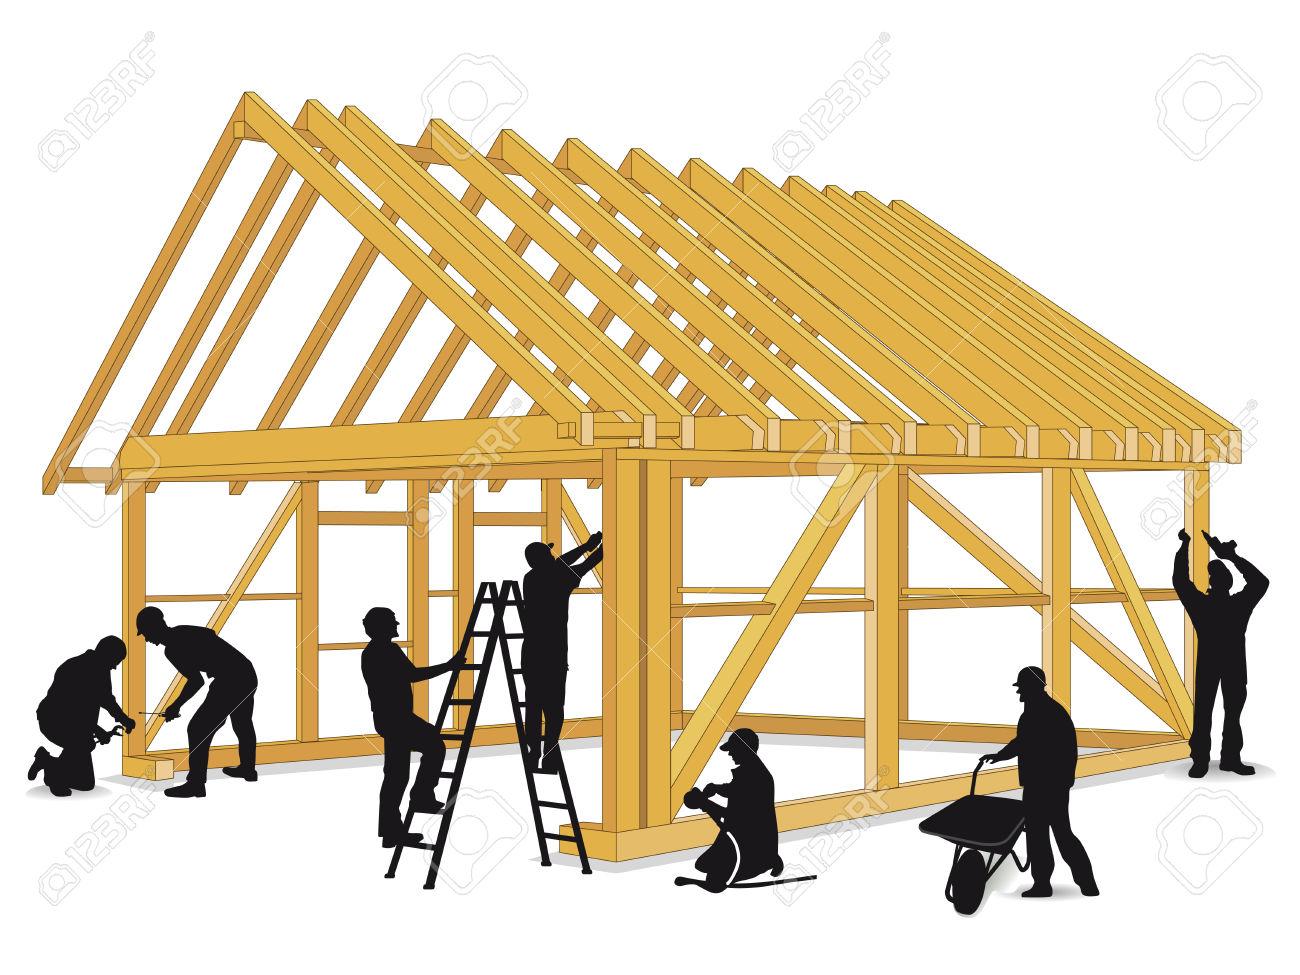 1300x975 Building A Wooden House Construction Worker Clipart, Explore Pictures